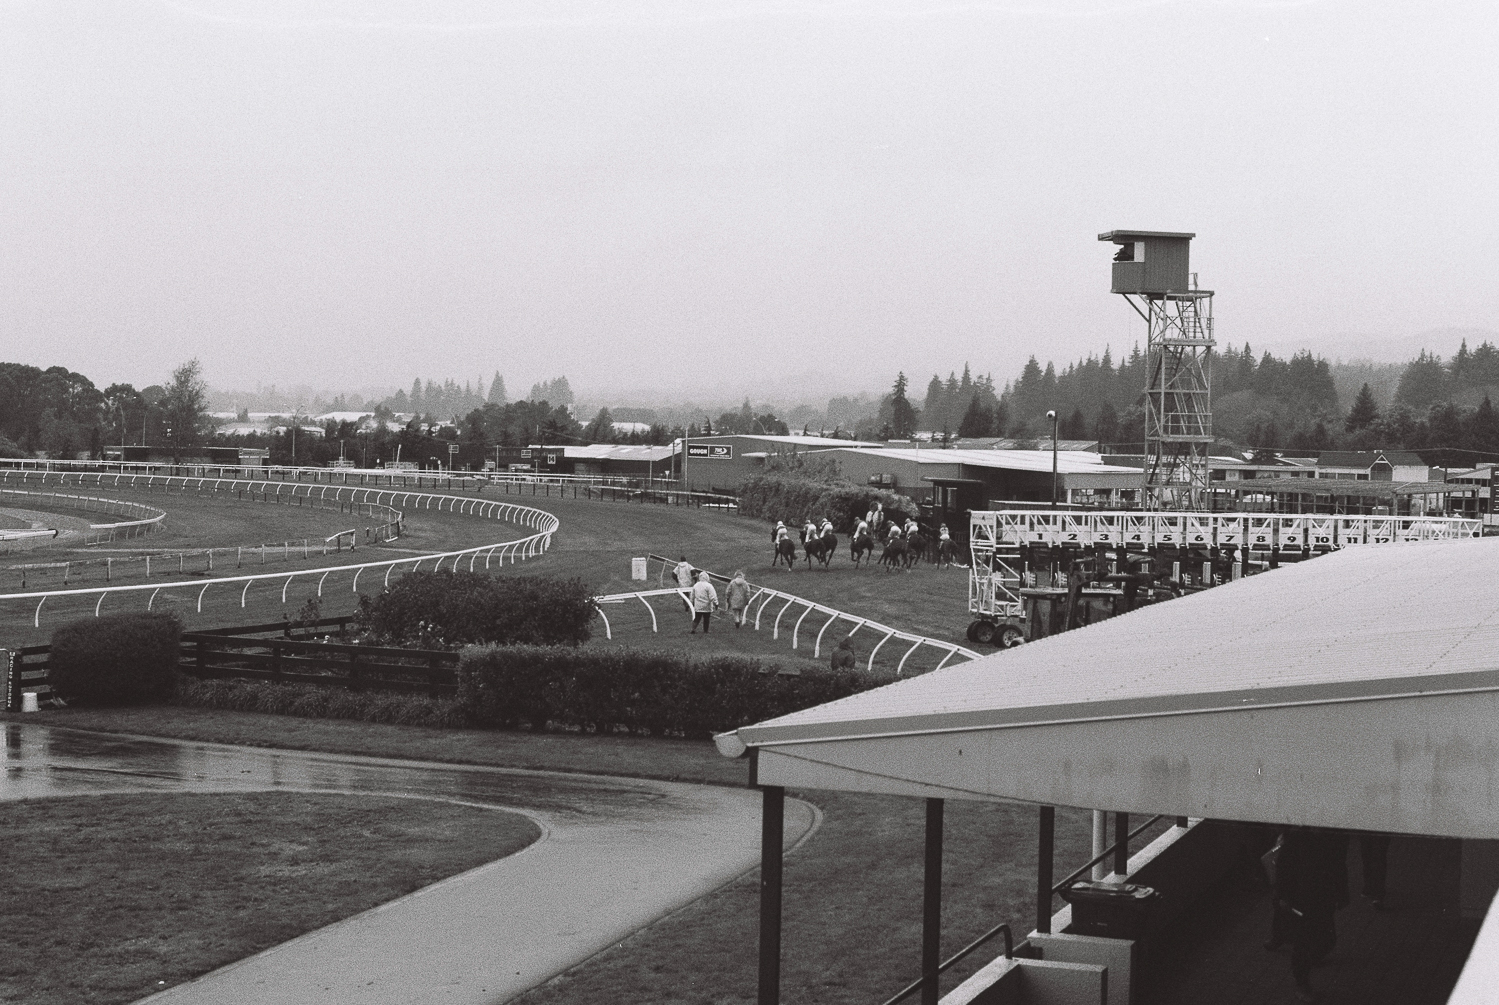 Race start, Rotorua Racecourse, April 2019